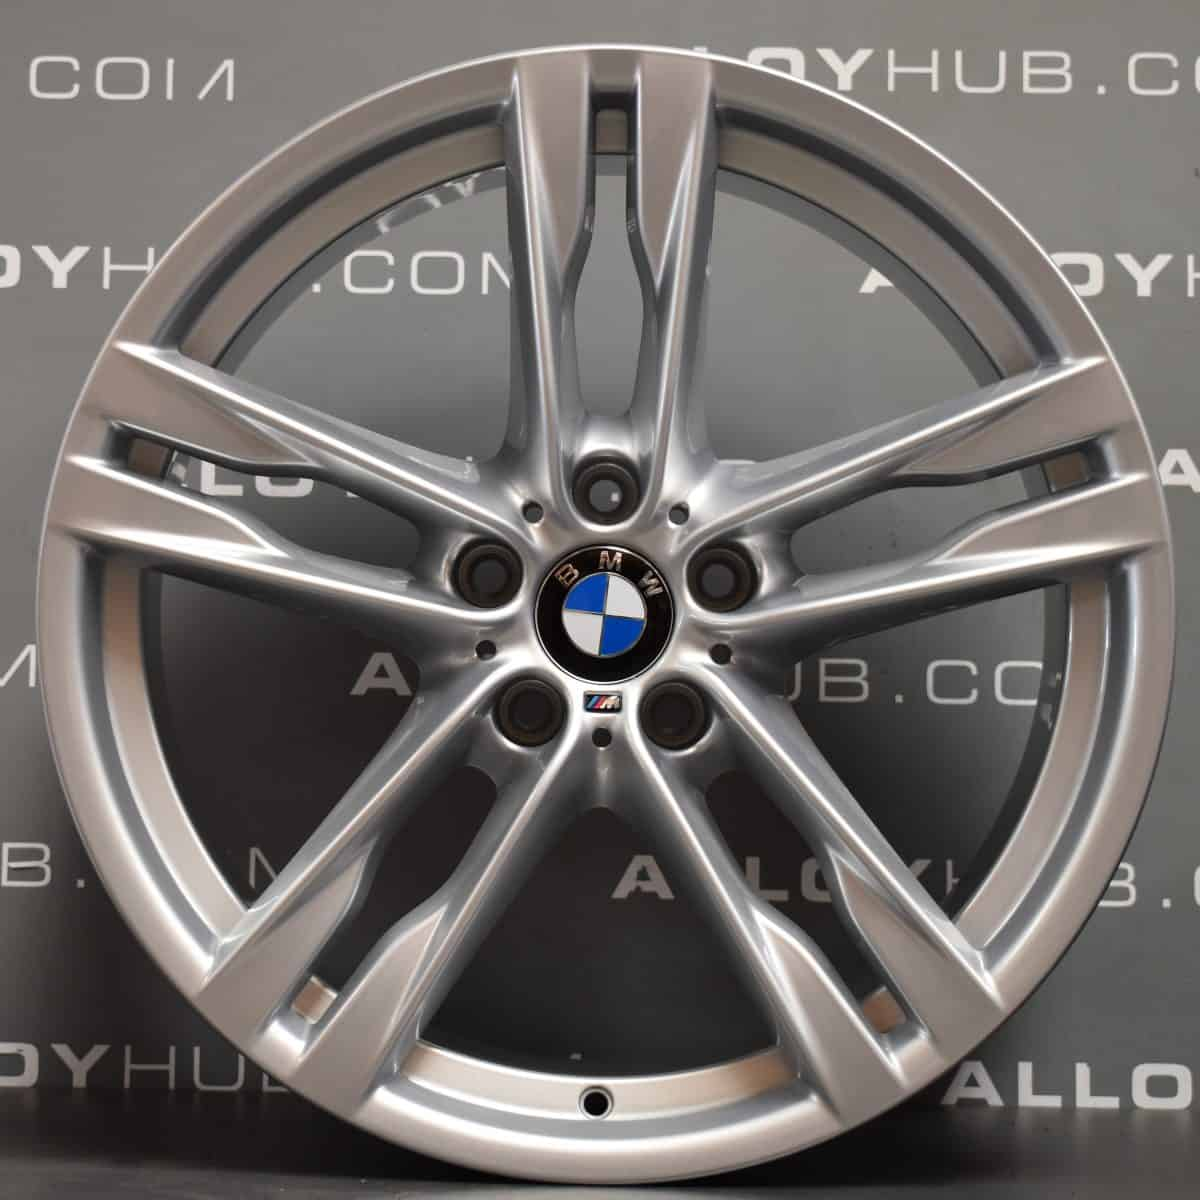 Genuine BMW 5/6 Series F10 F11 F12 F13 F06 Style 373M Sport 20″ inch 5 Twin Spoke Alloy Wheels with Silver Finish 36117843715 36117843716